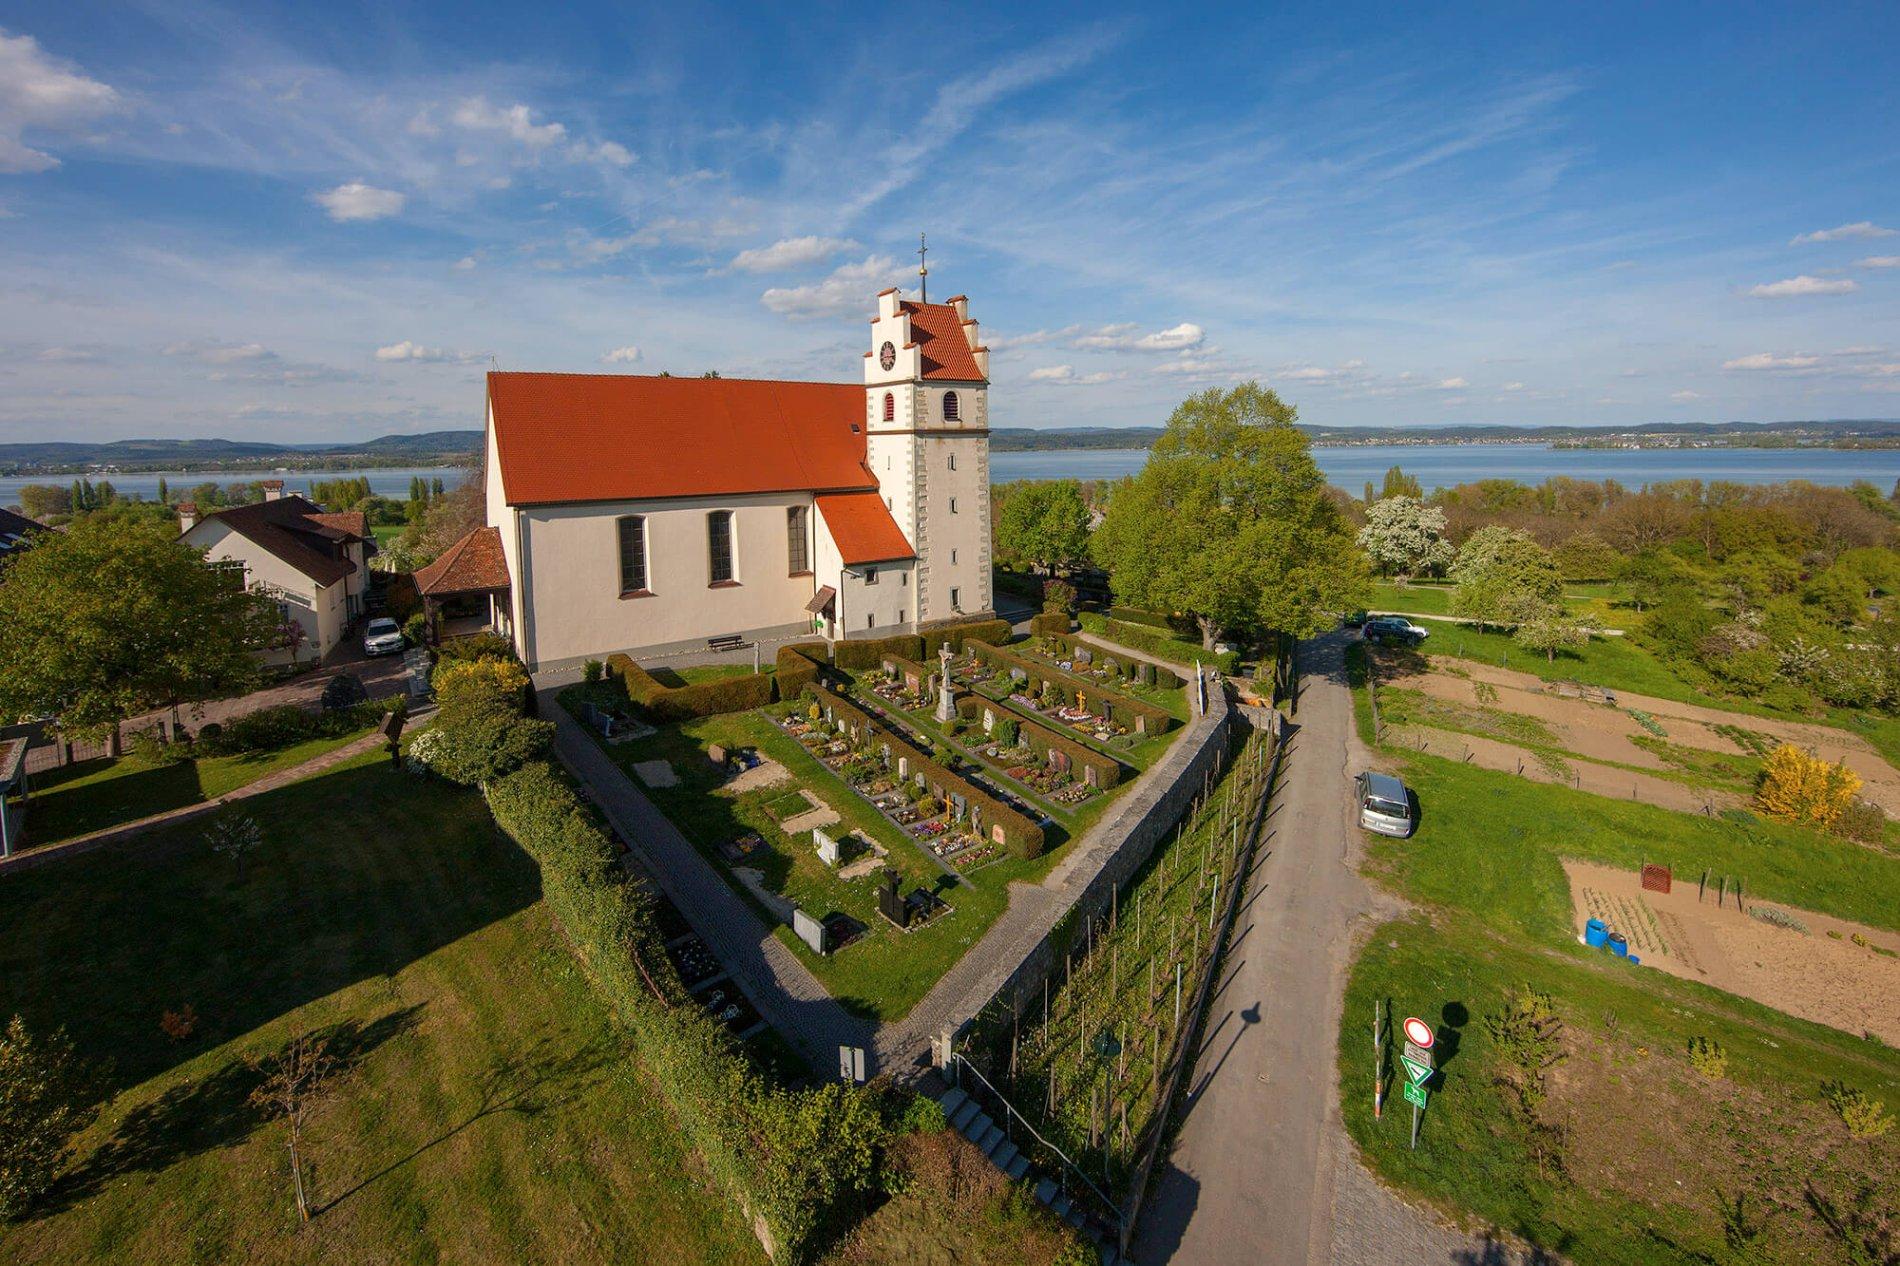 Luftaufnahme Kath. Pfarrkirche St. Johann